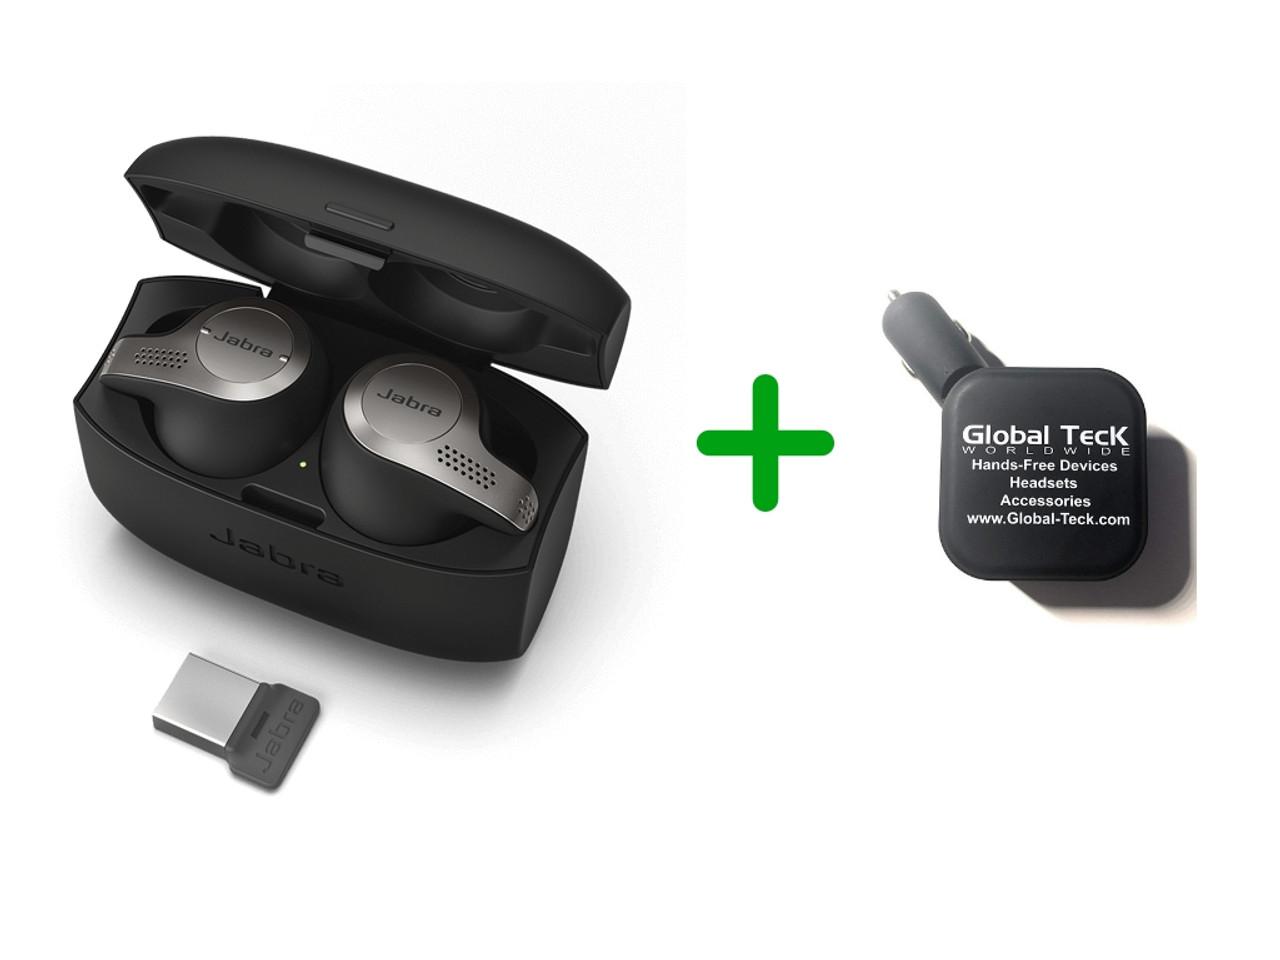 Jabra 65T Bluetooth Headset Earbuds - Evolve 65T | Wireless Bluetooth for  Music | UC Version | #6598-832-209-C